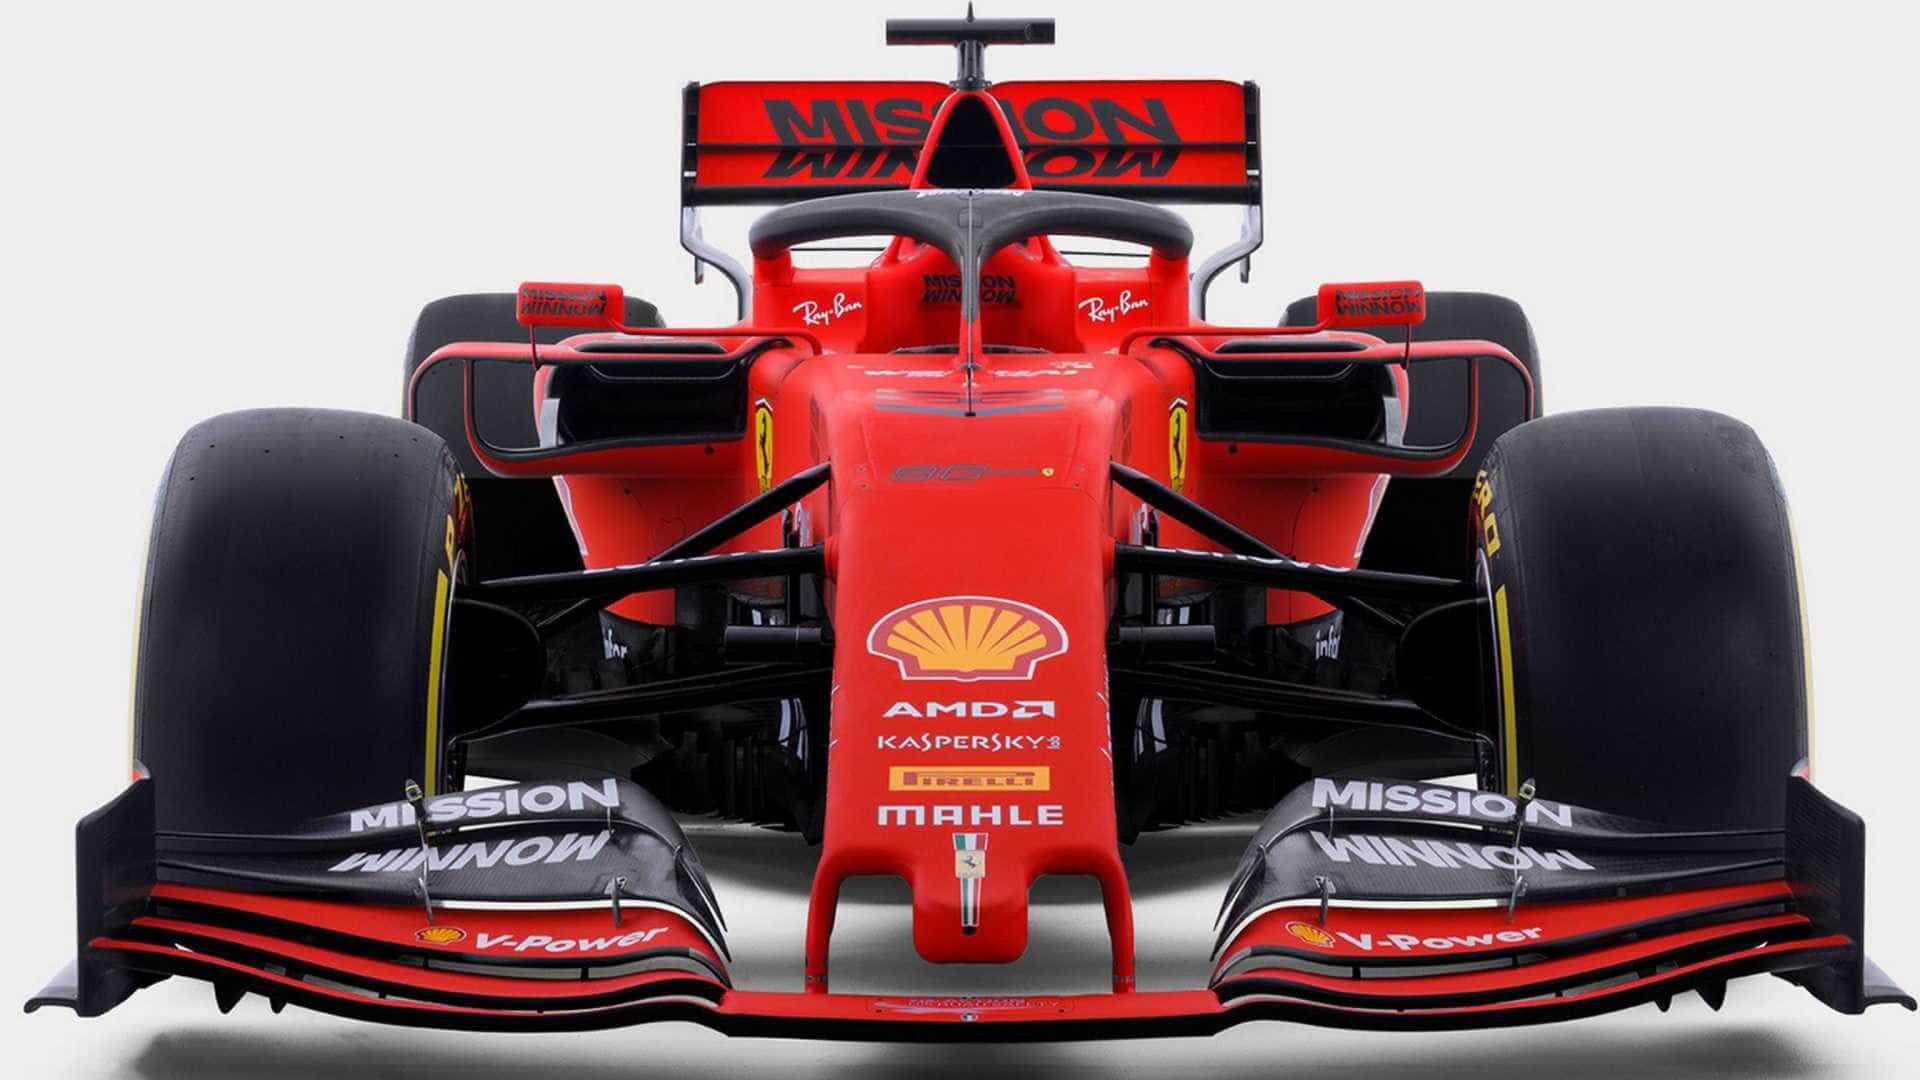 Com esperança superar a Mercedes, Ferrari apresenta carro para 2019